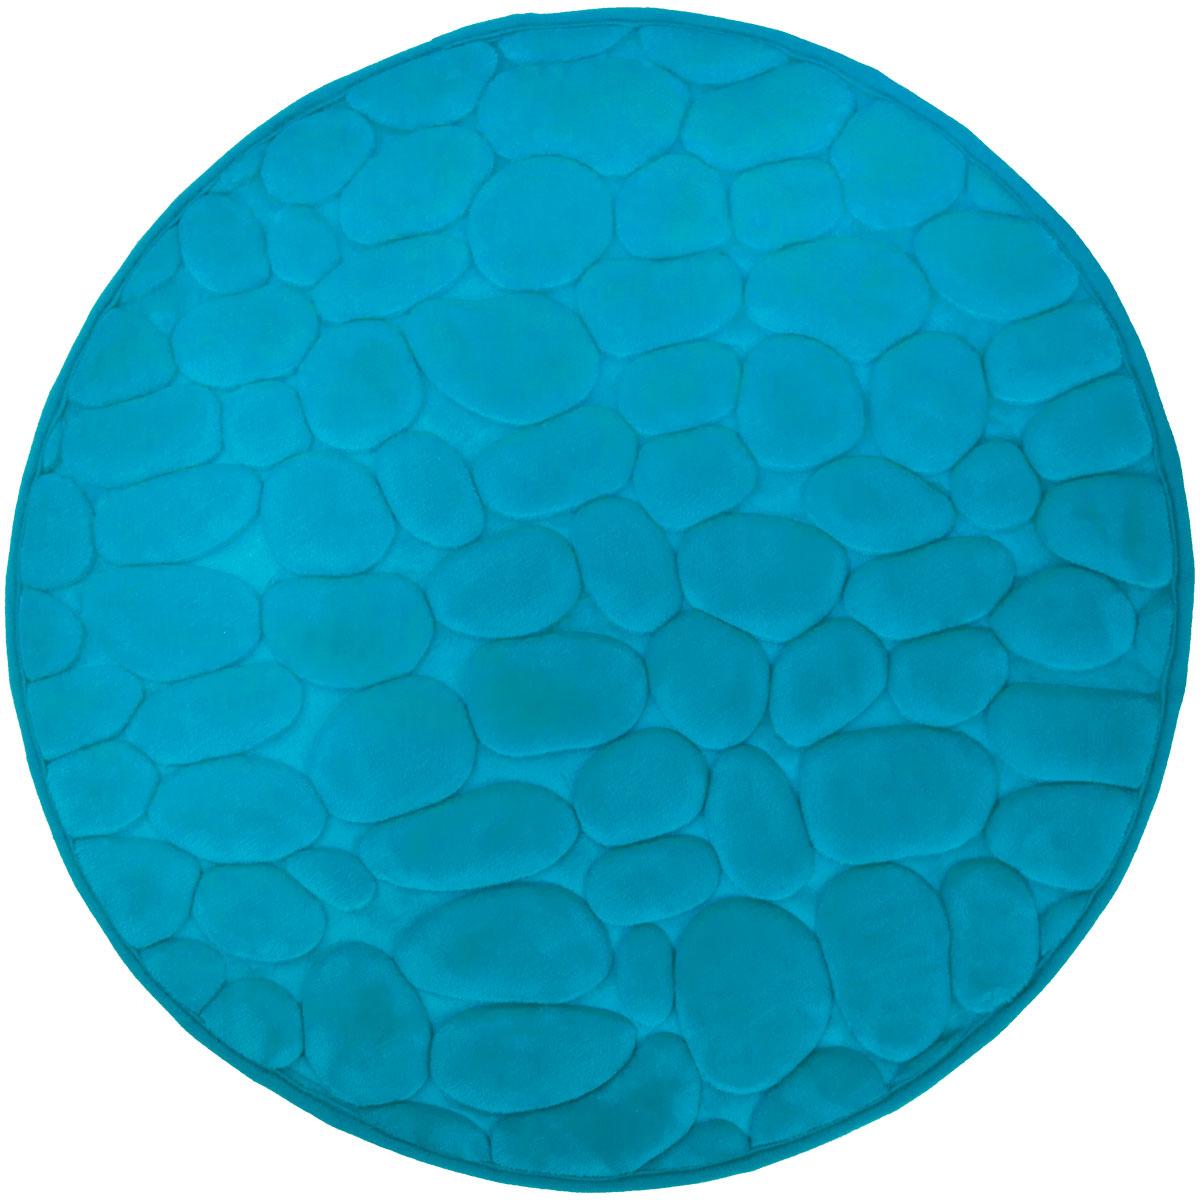 Super mäkká kúpeľňa koberec 60cm 3D tyrkysové